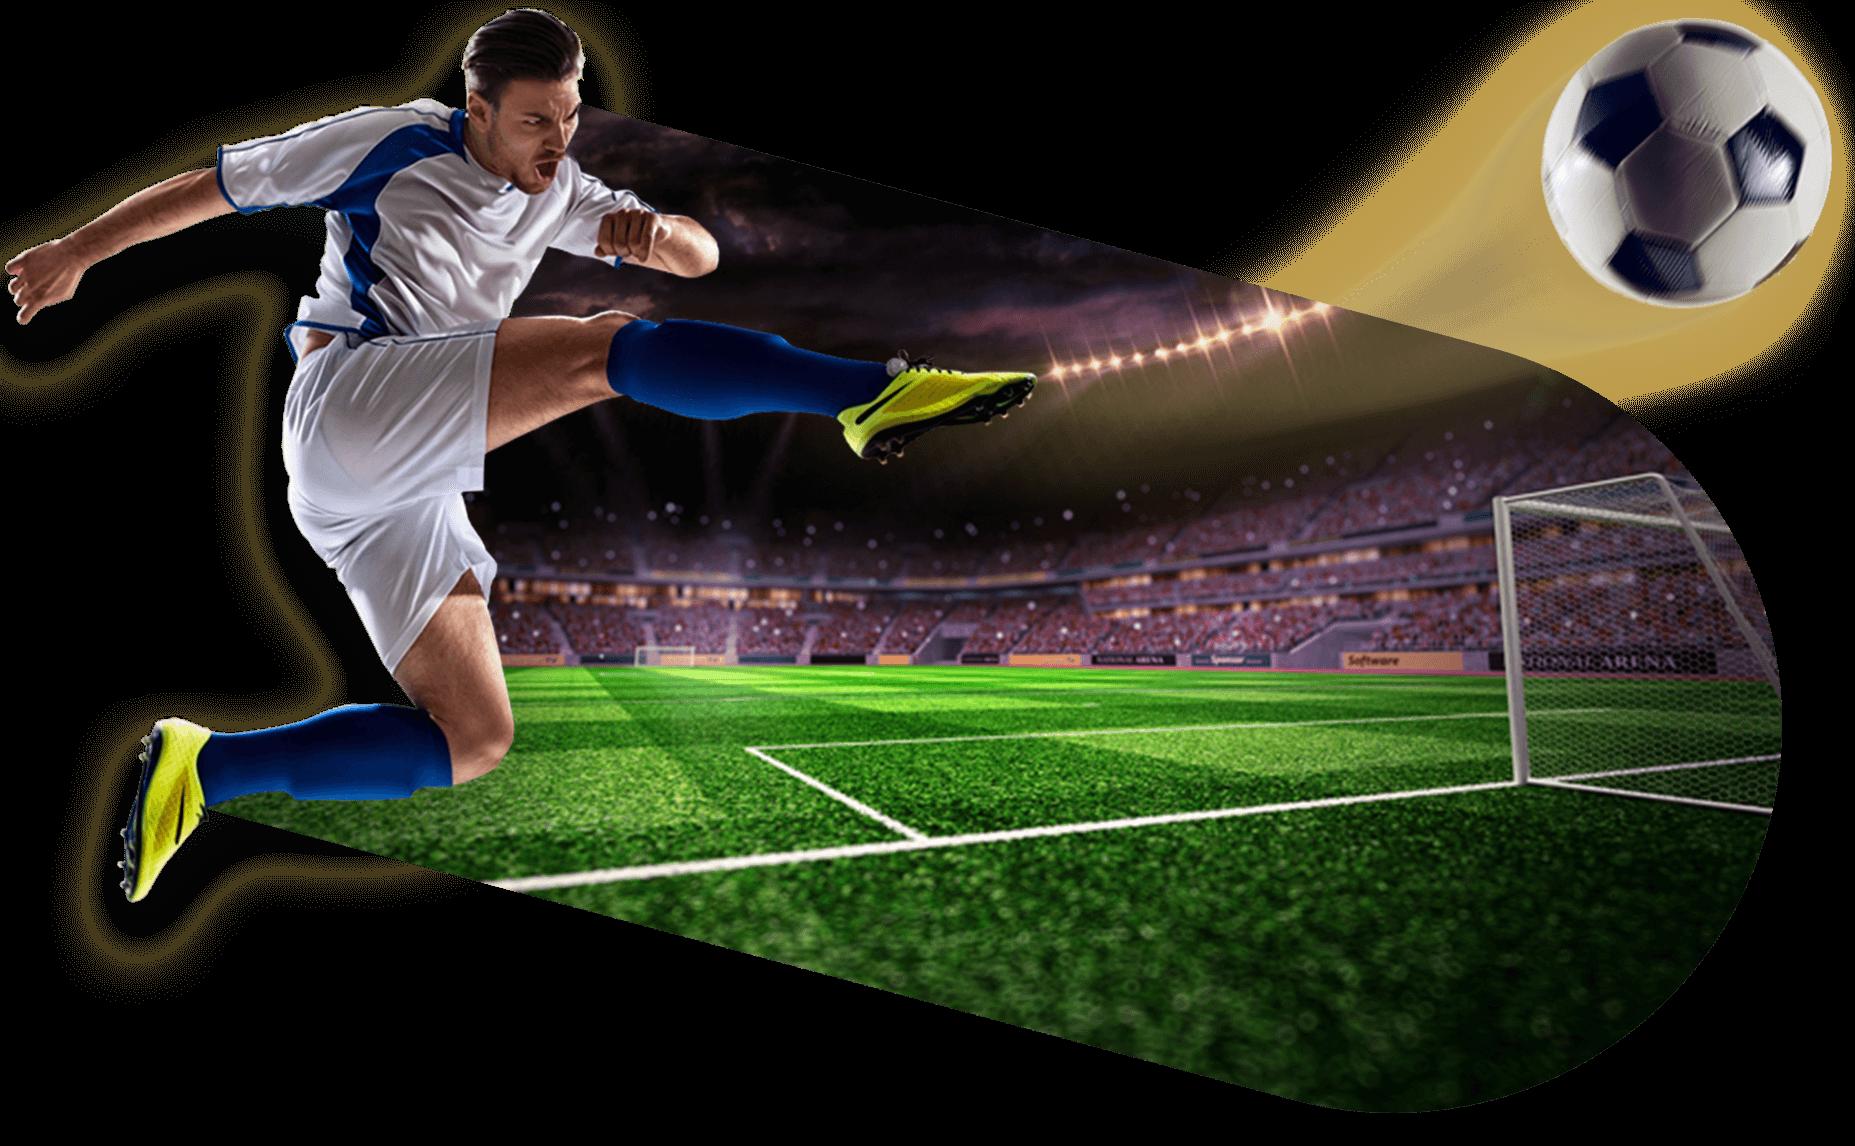 €5 No deposit bonus +100% Sportsbook Welcome Bonus up to €150